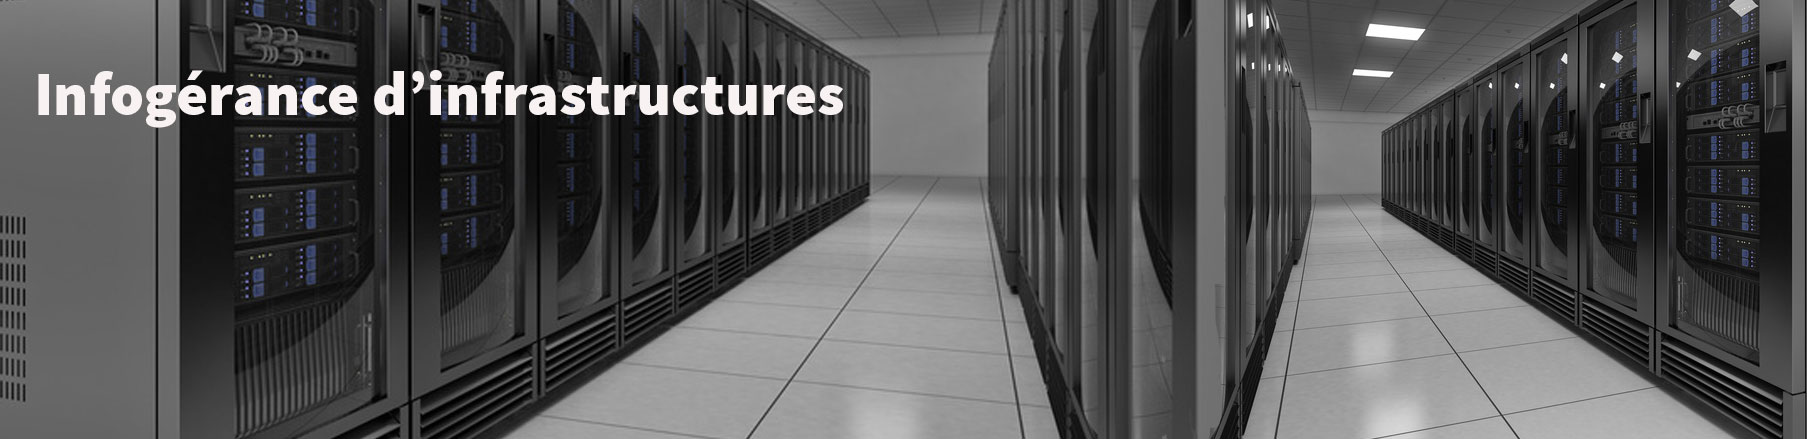 infogerance-d-infrastructures